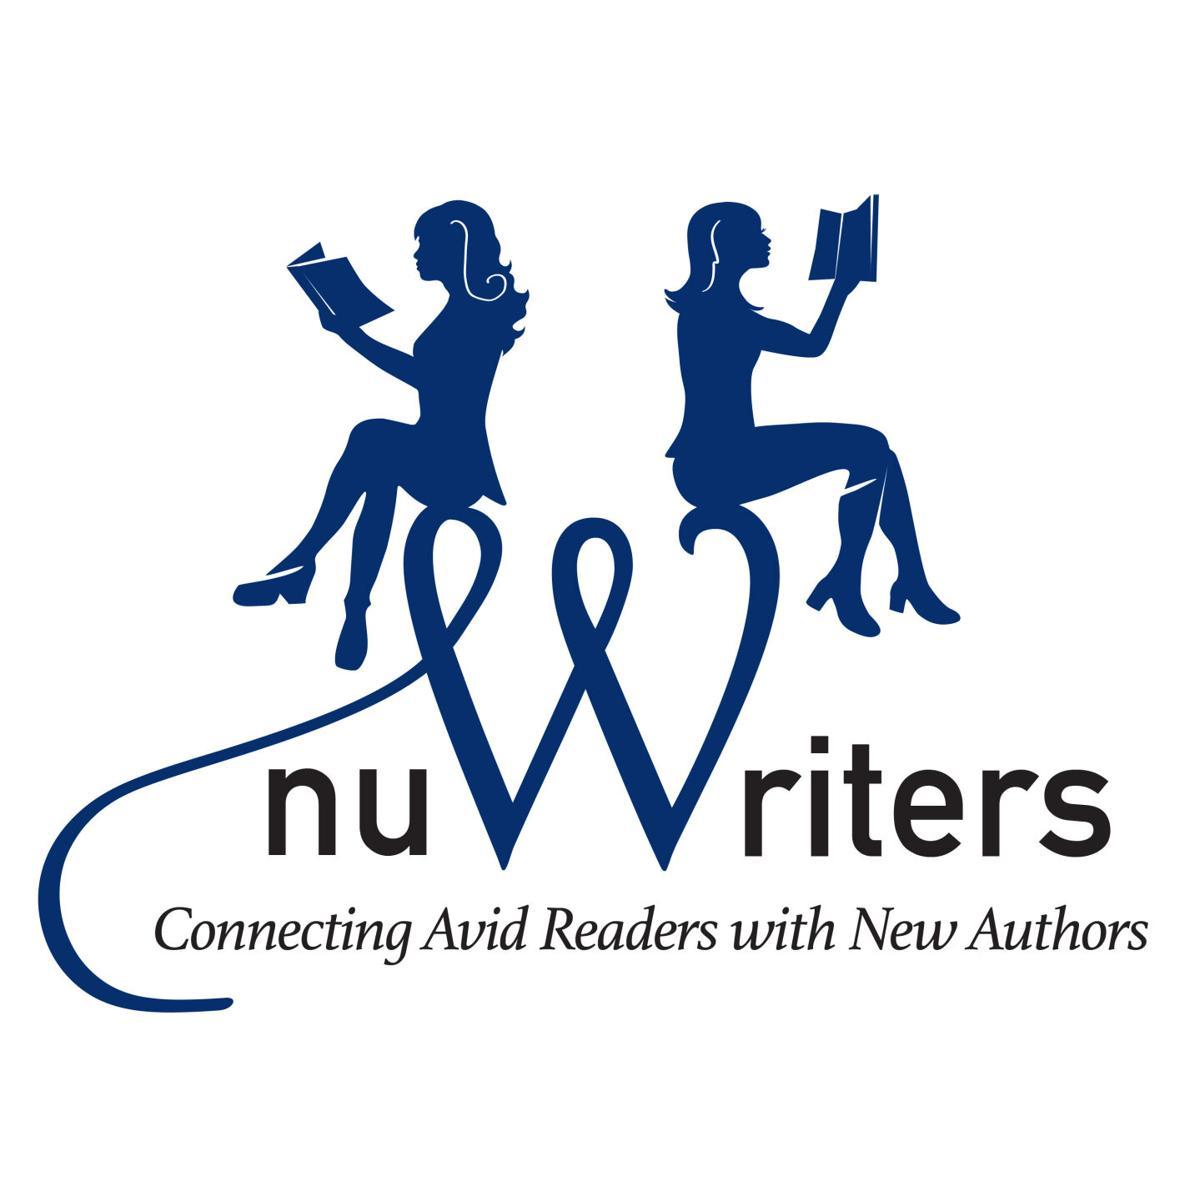 050521-cr-nuwriters2